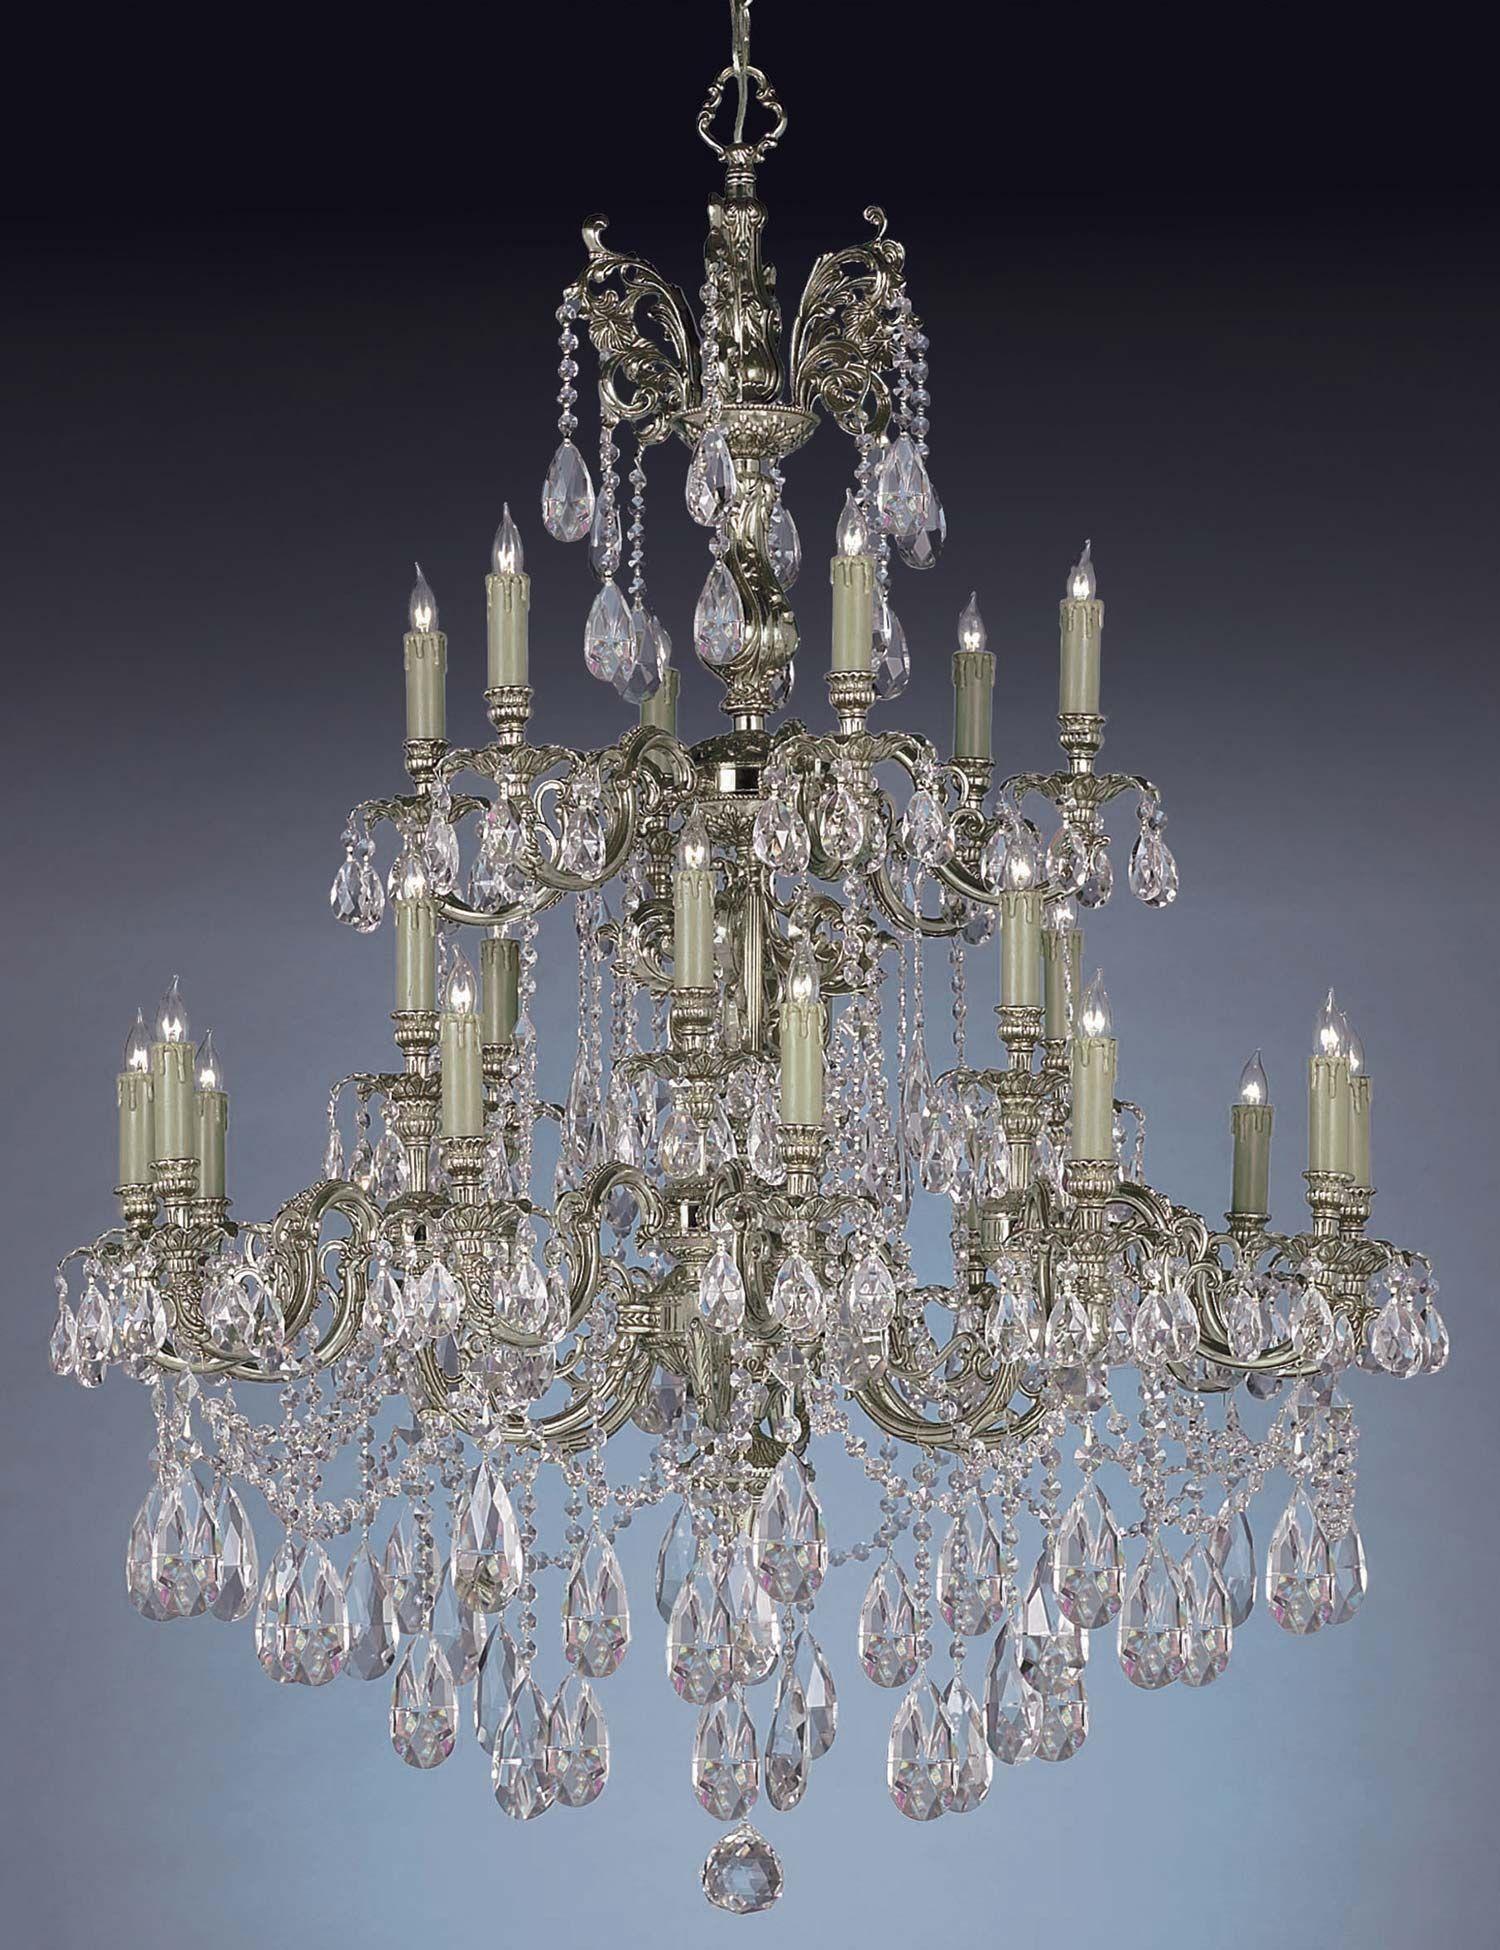 Crystorama 24 light novella chandelier chandeliersmirrorslamps crystorama 24 light novella chandelier mozeypictures Gallery